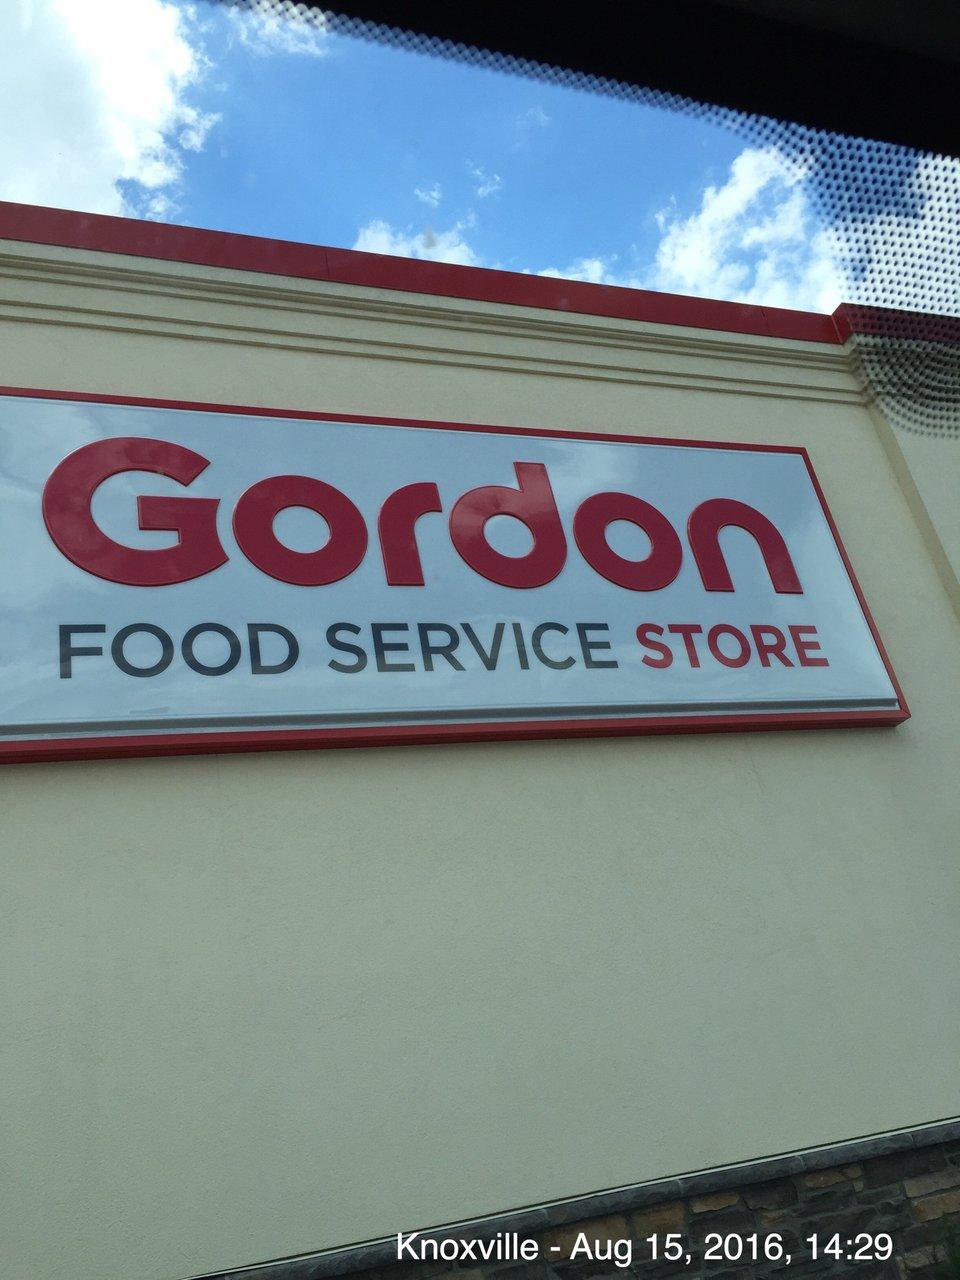 Gordon Food Service 9312 Kingston Pike, Knoxville